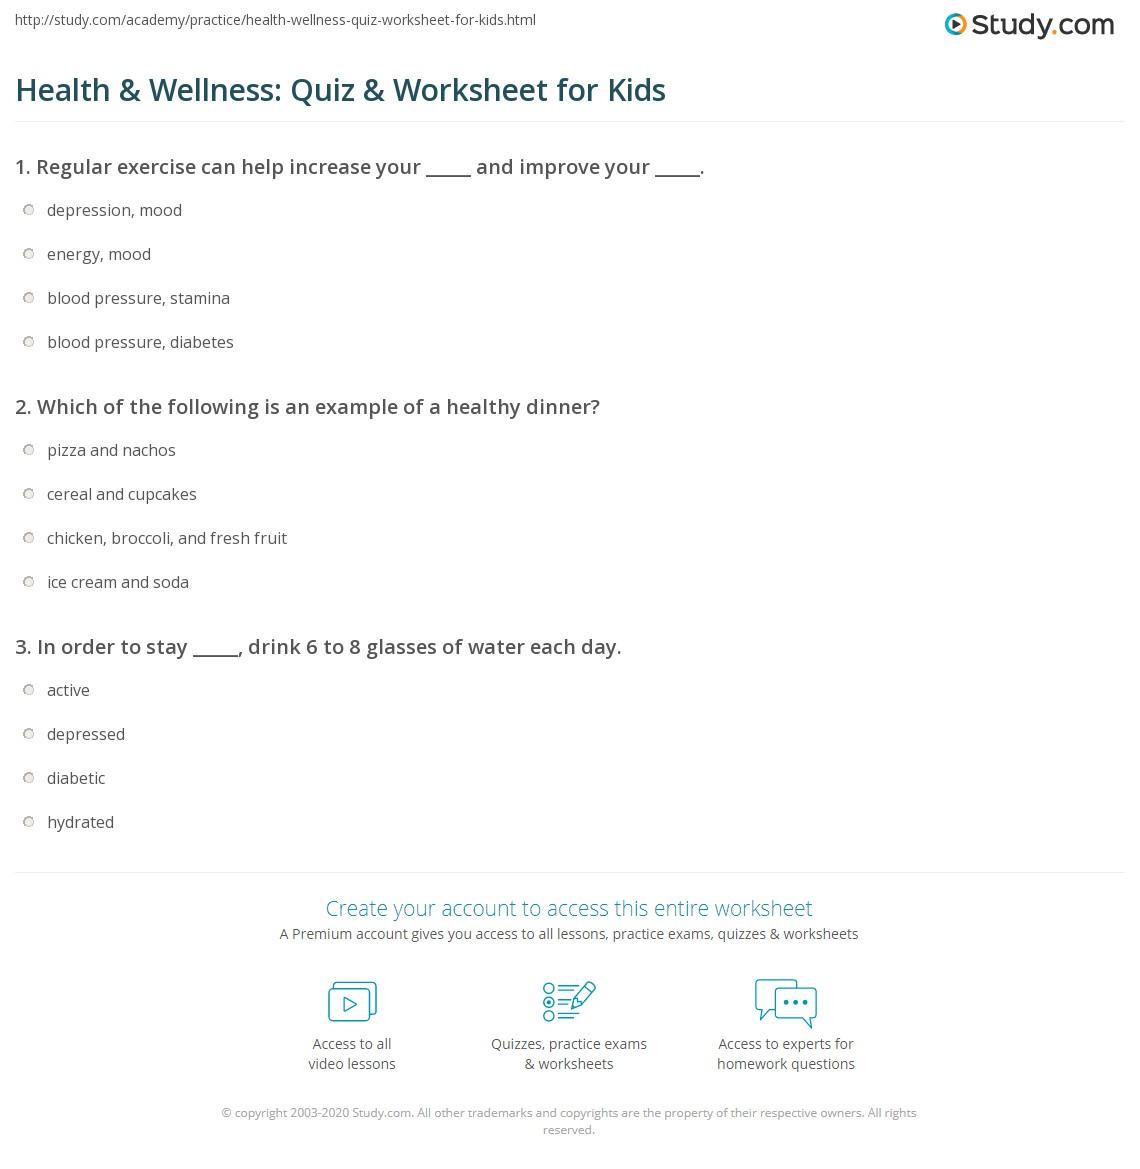 hight resolution of Health \u0026 Wellness: Quiz \u0026 Worksheet for Kids   Study.com